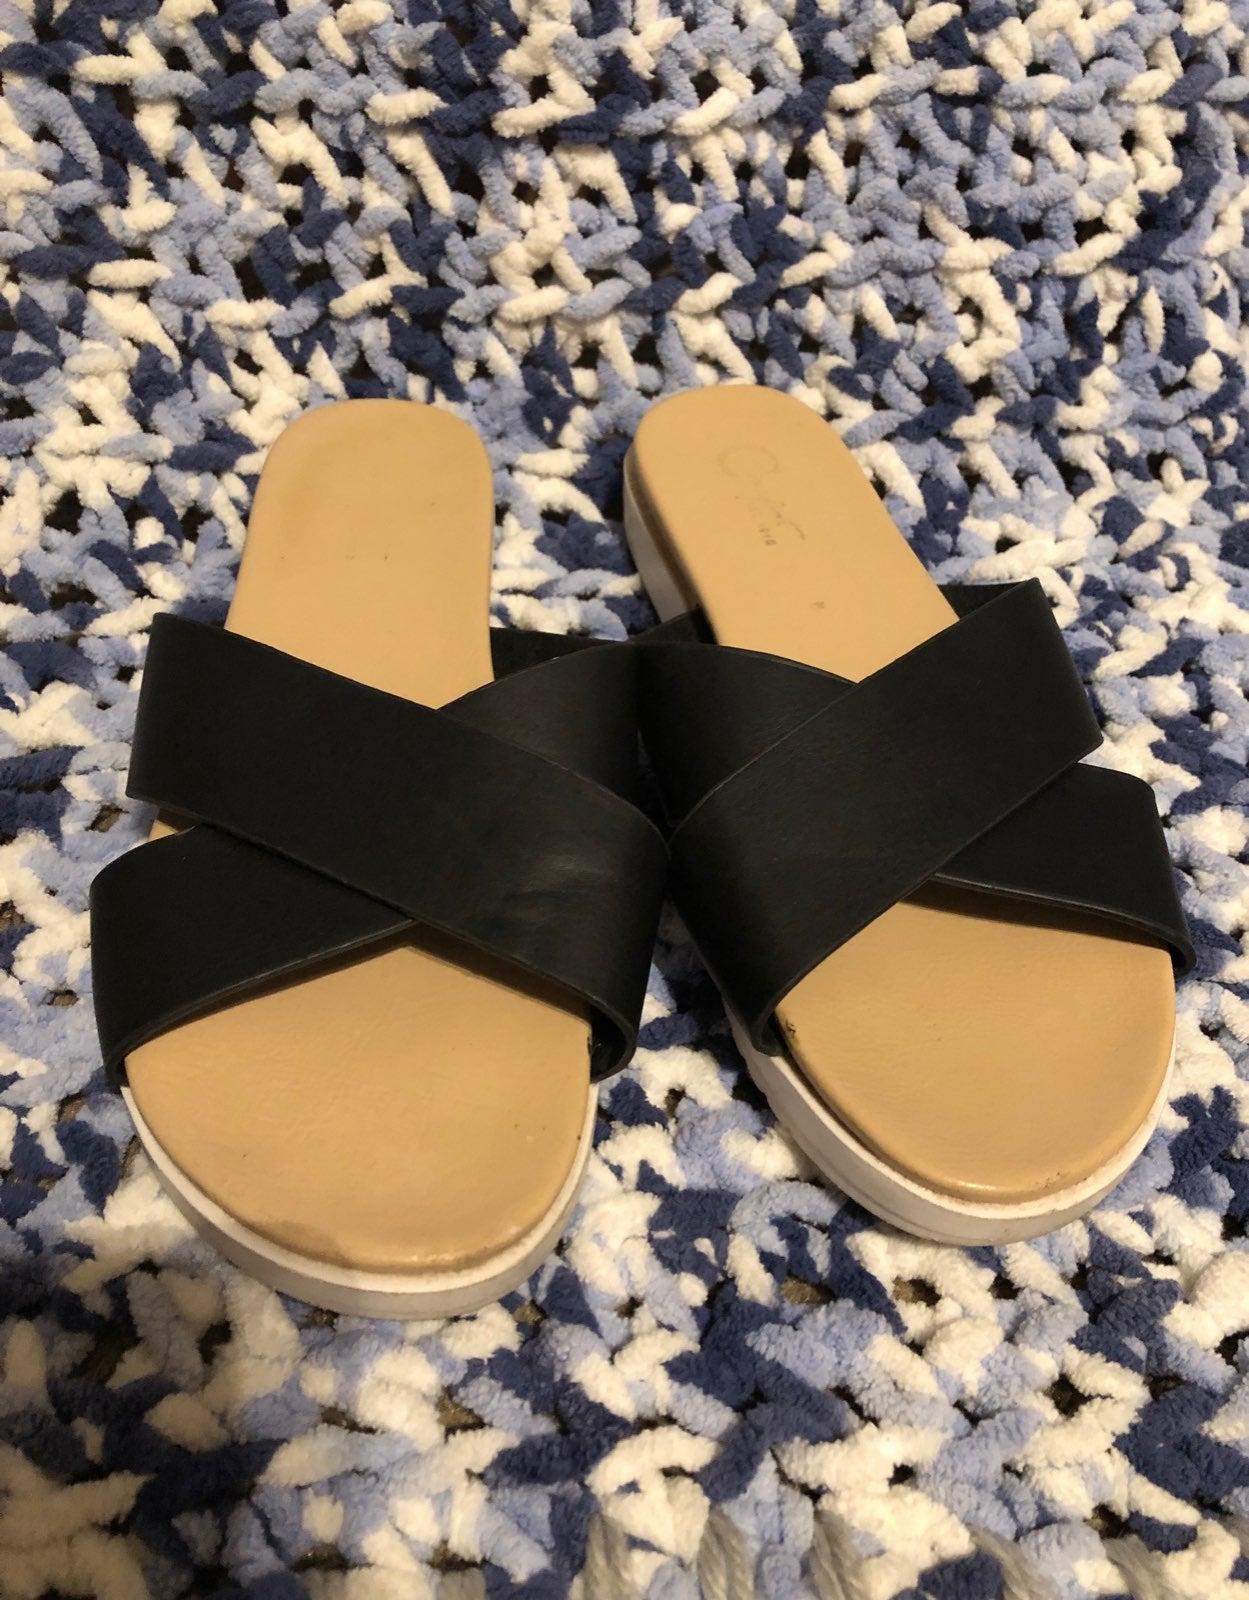 Black criss-cross sandals